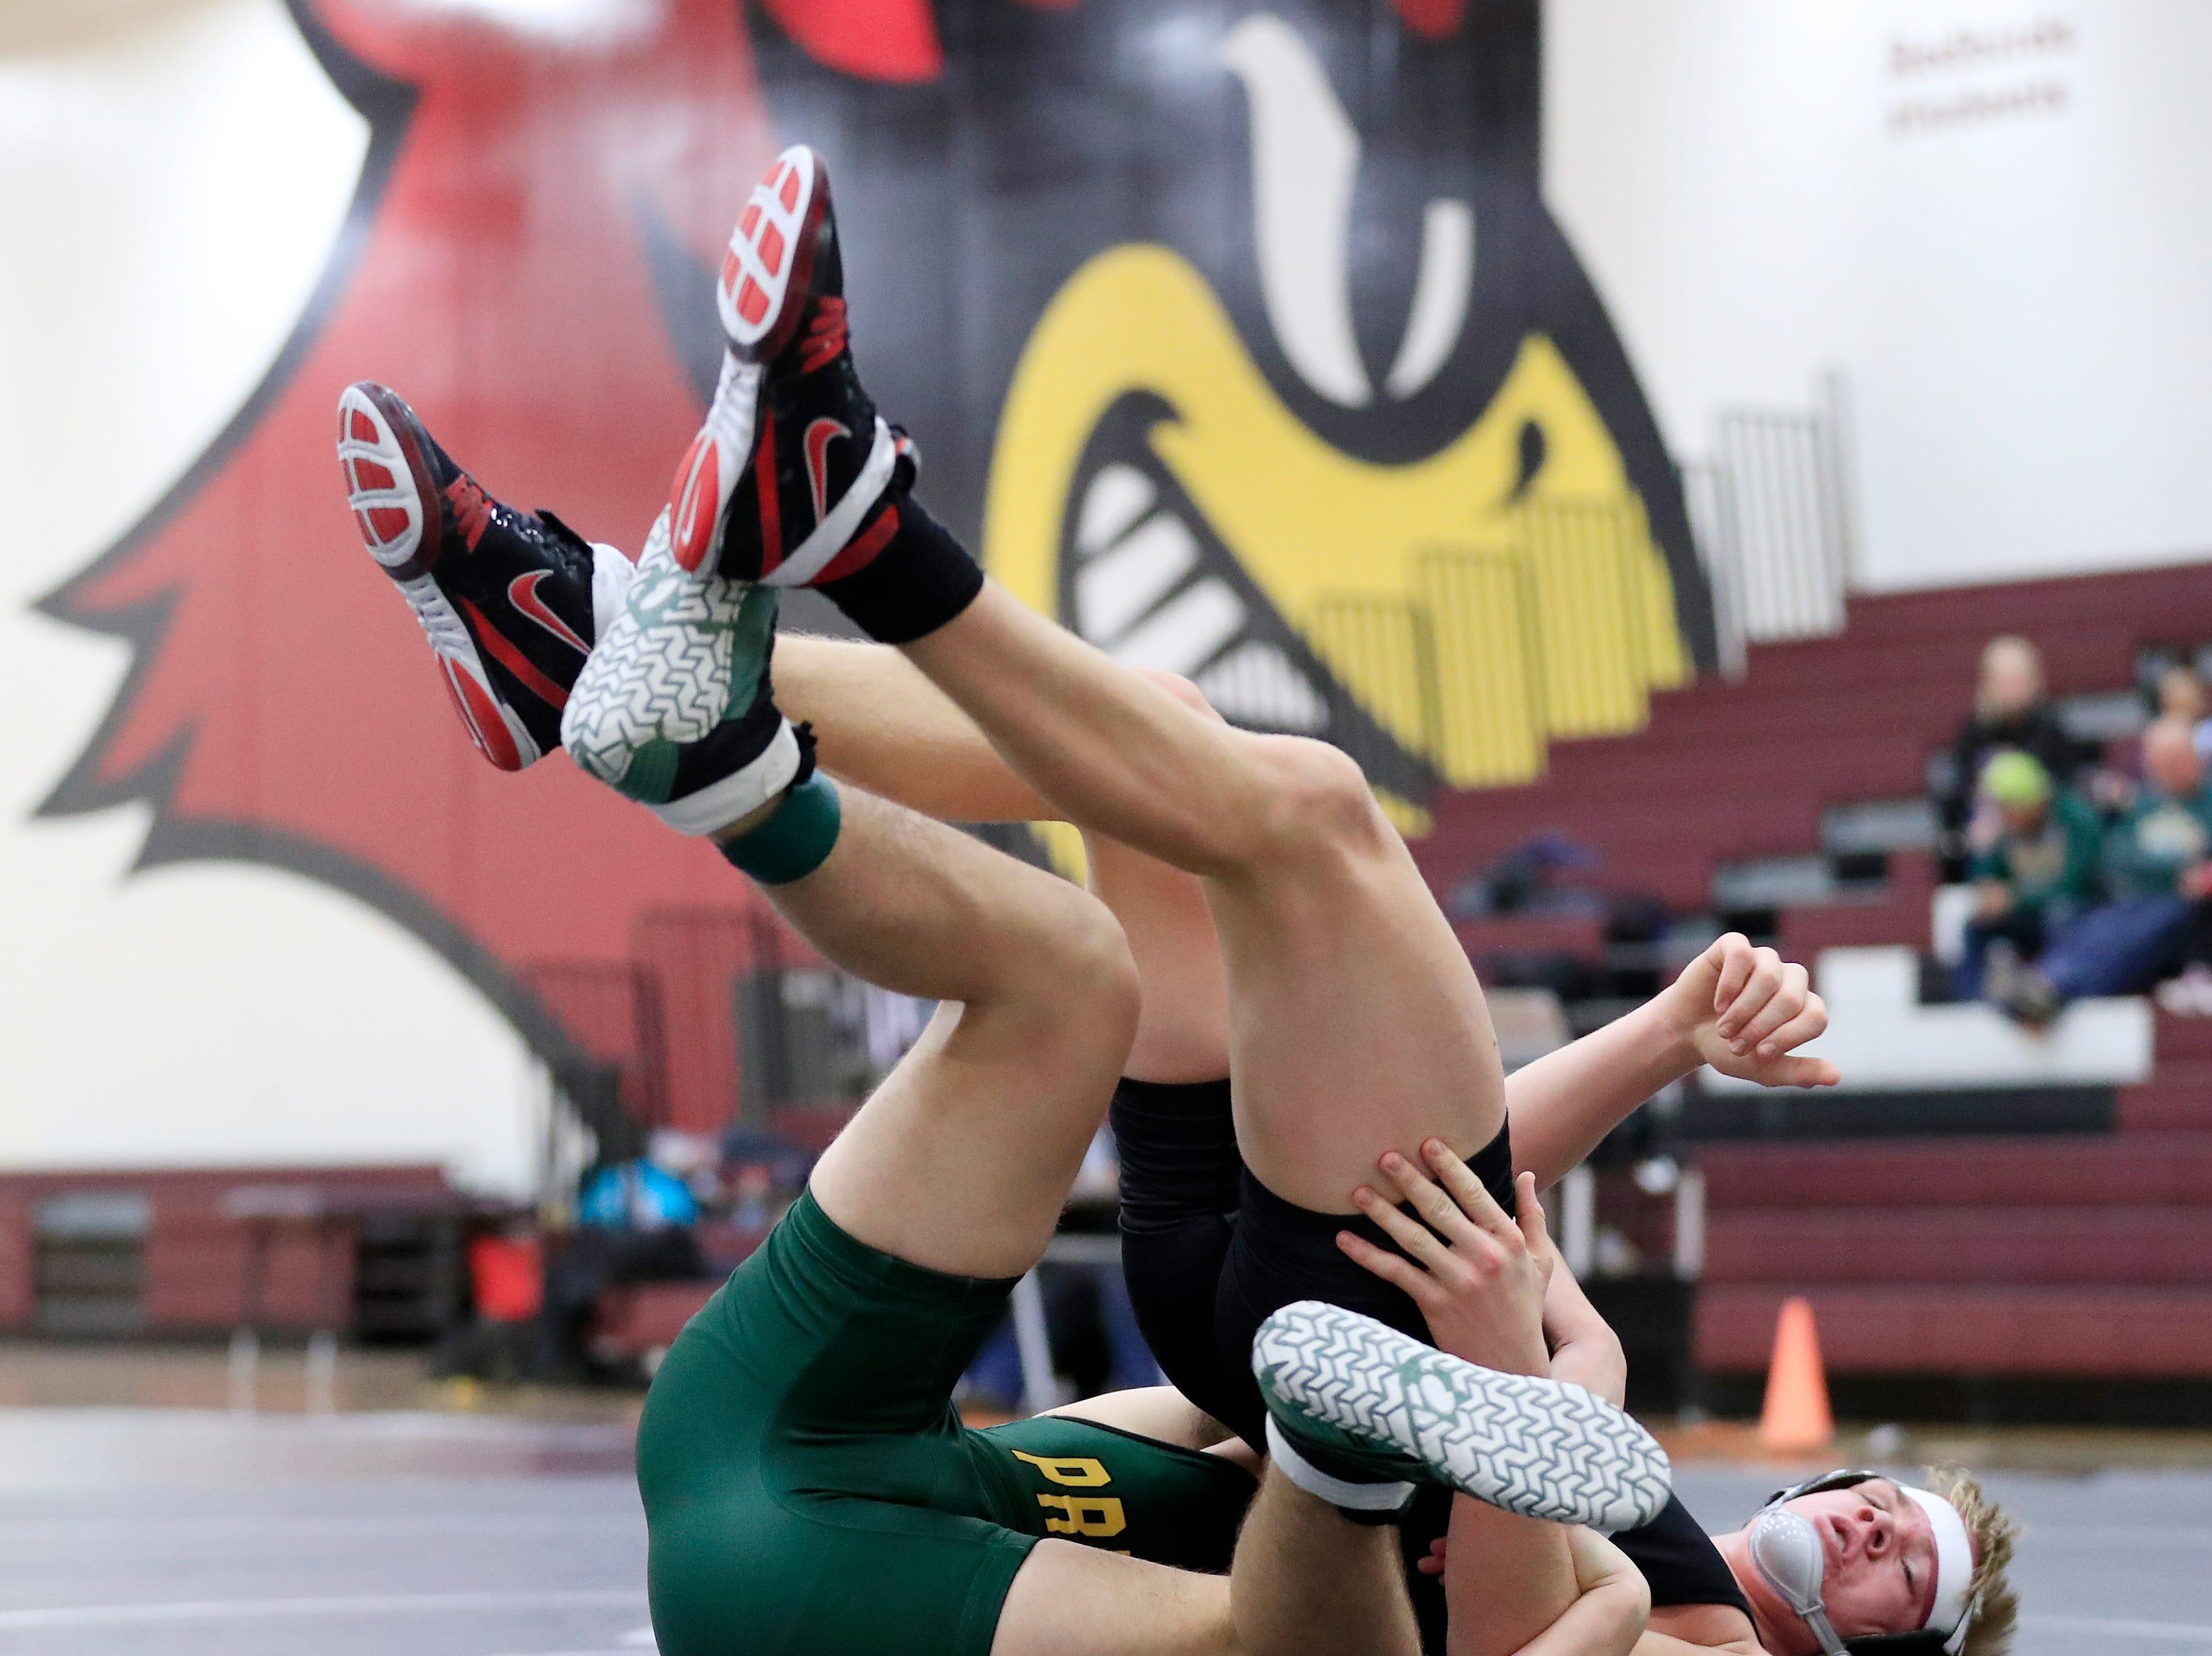 De Pere's Hayden Kincade wrestles Green Bay Preble's Devin LaPlante in a 170-pound bout at De Pere high school on Thursday, December 13, 2018 in De Pere, Wis.